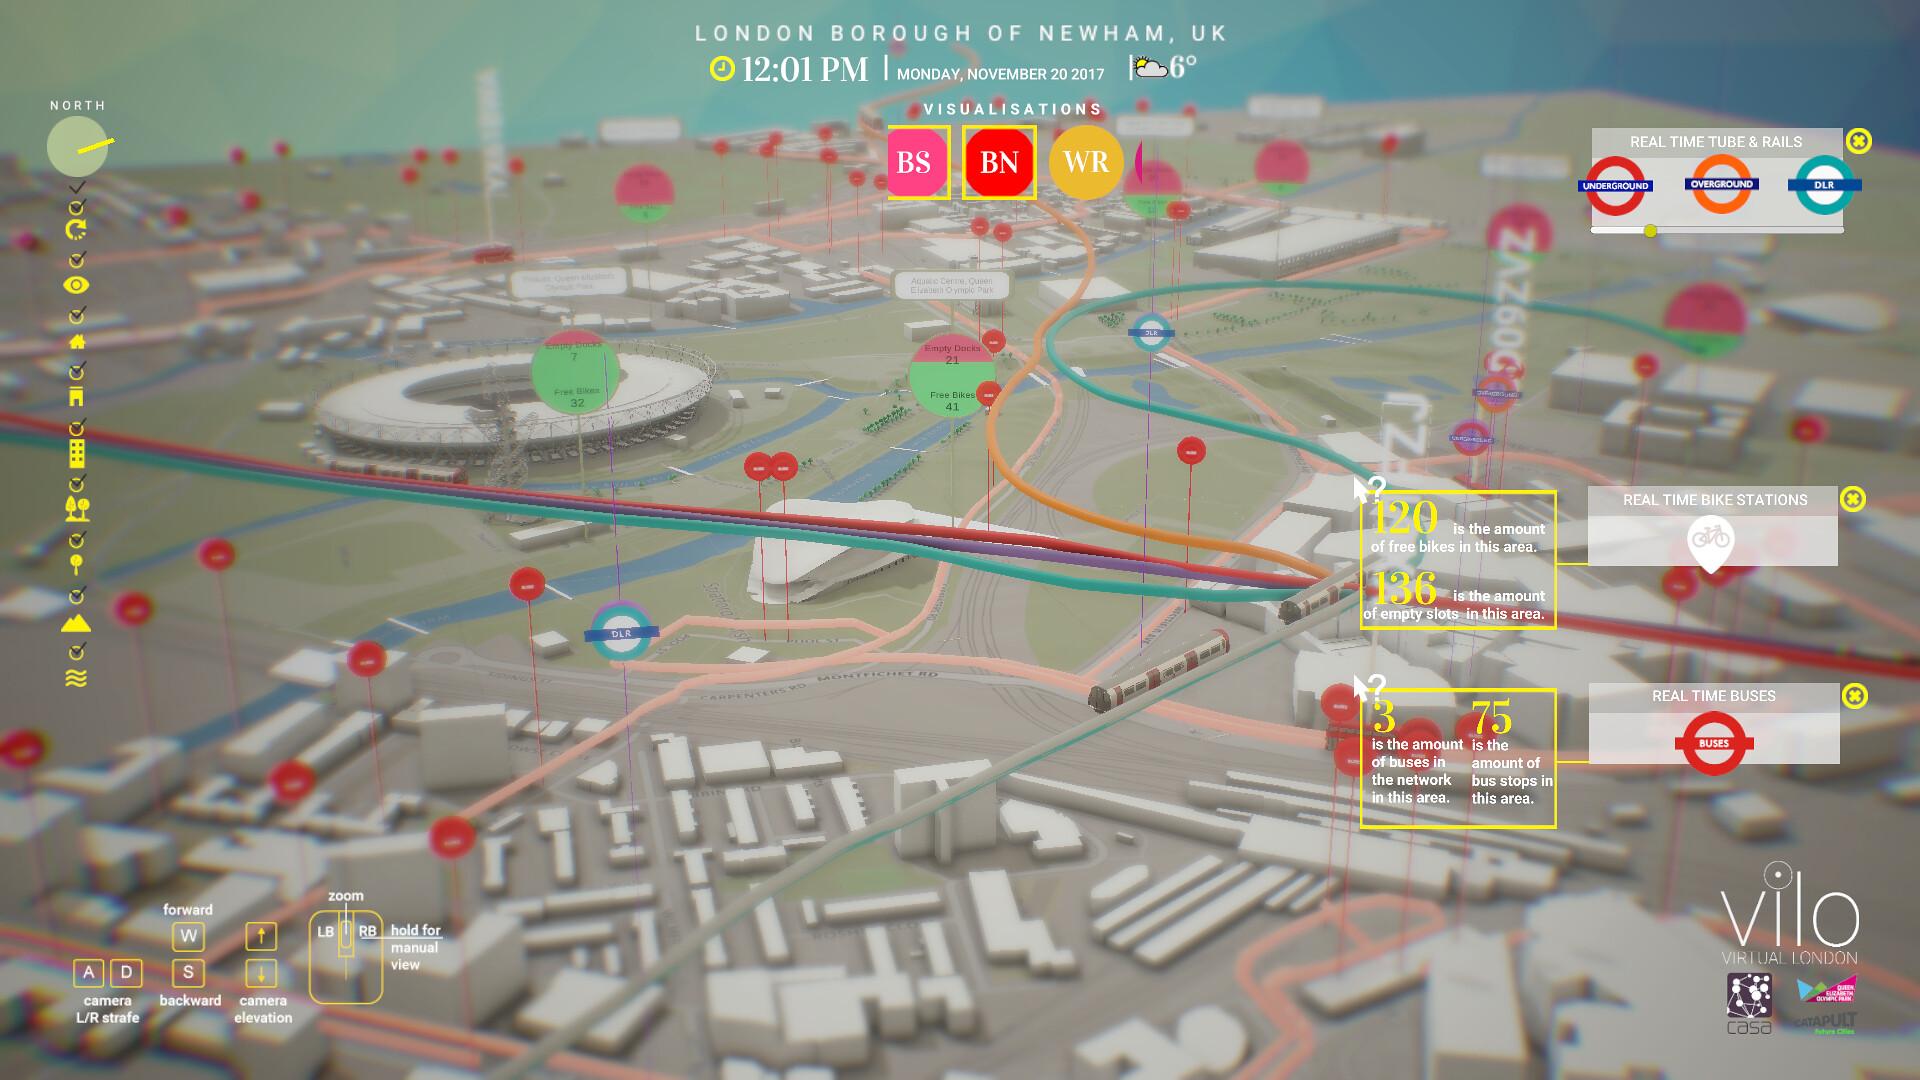 ViLo model of Olympic Park